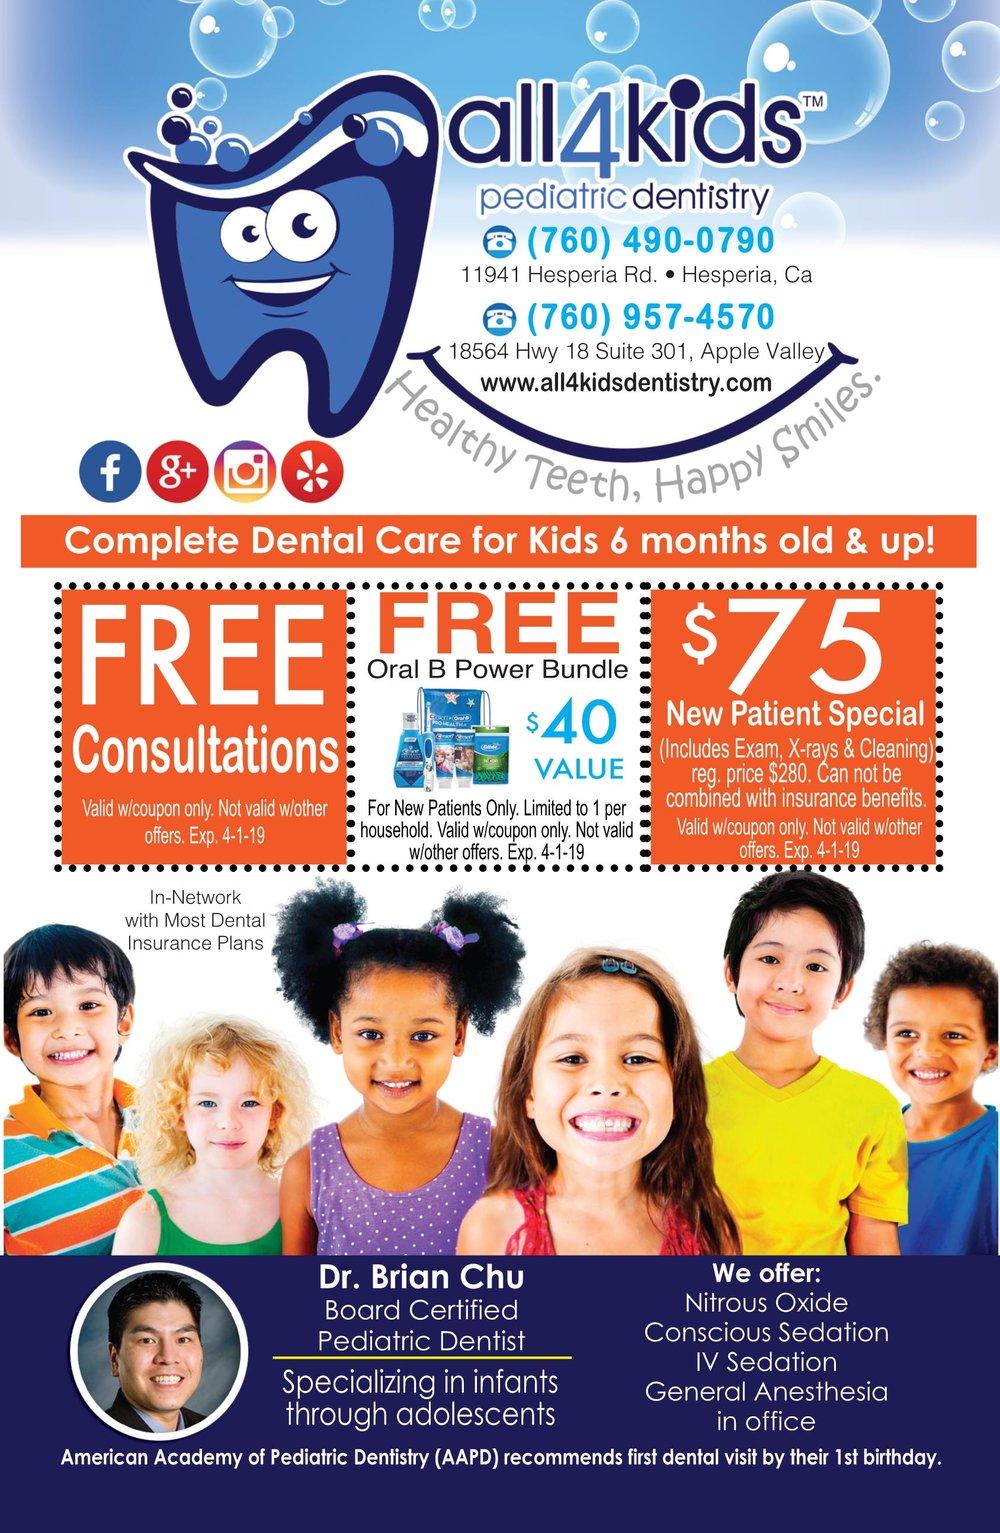 All4Kids Pediatric Dentistry.jpg